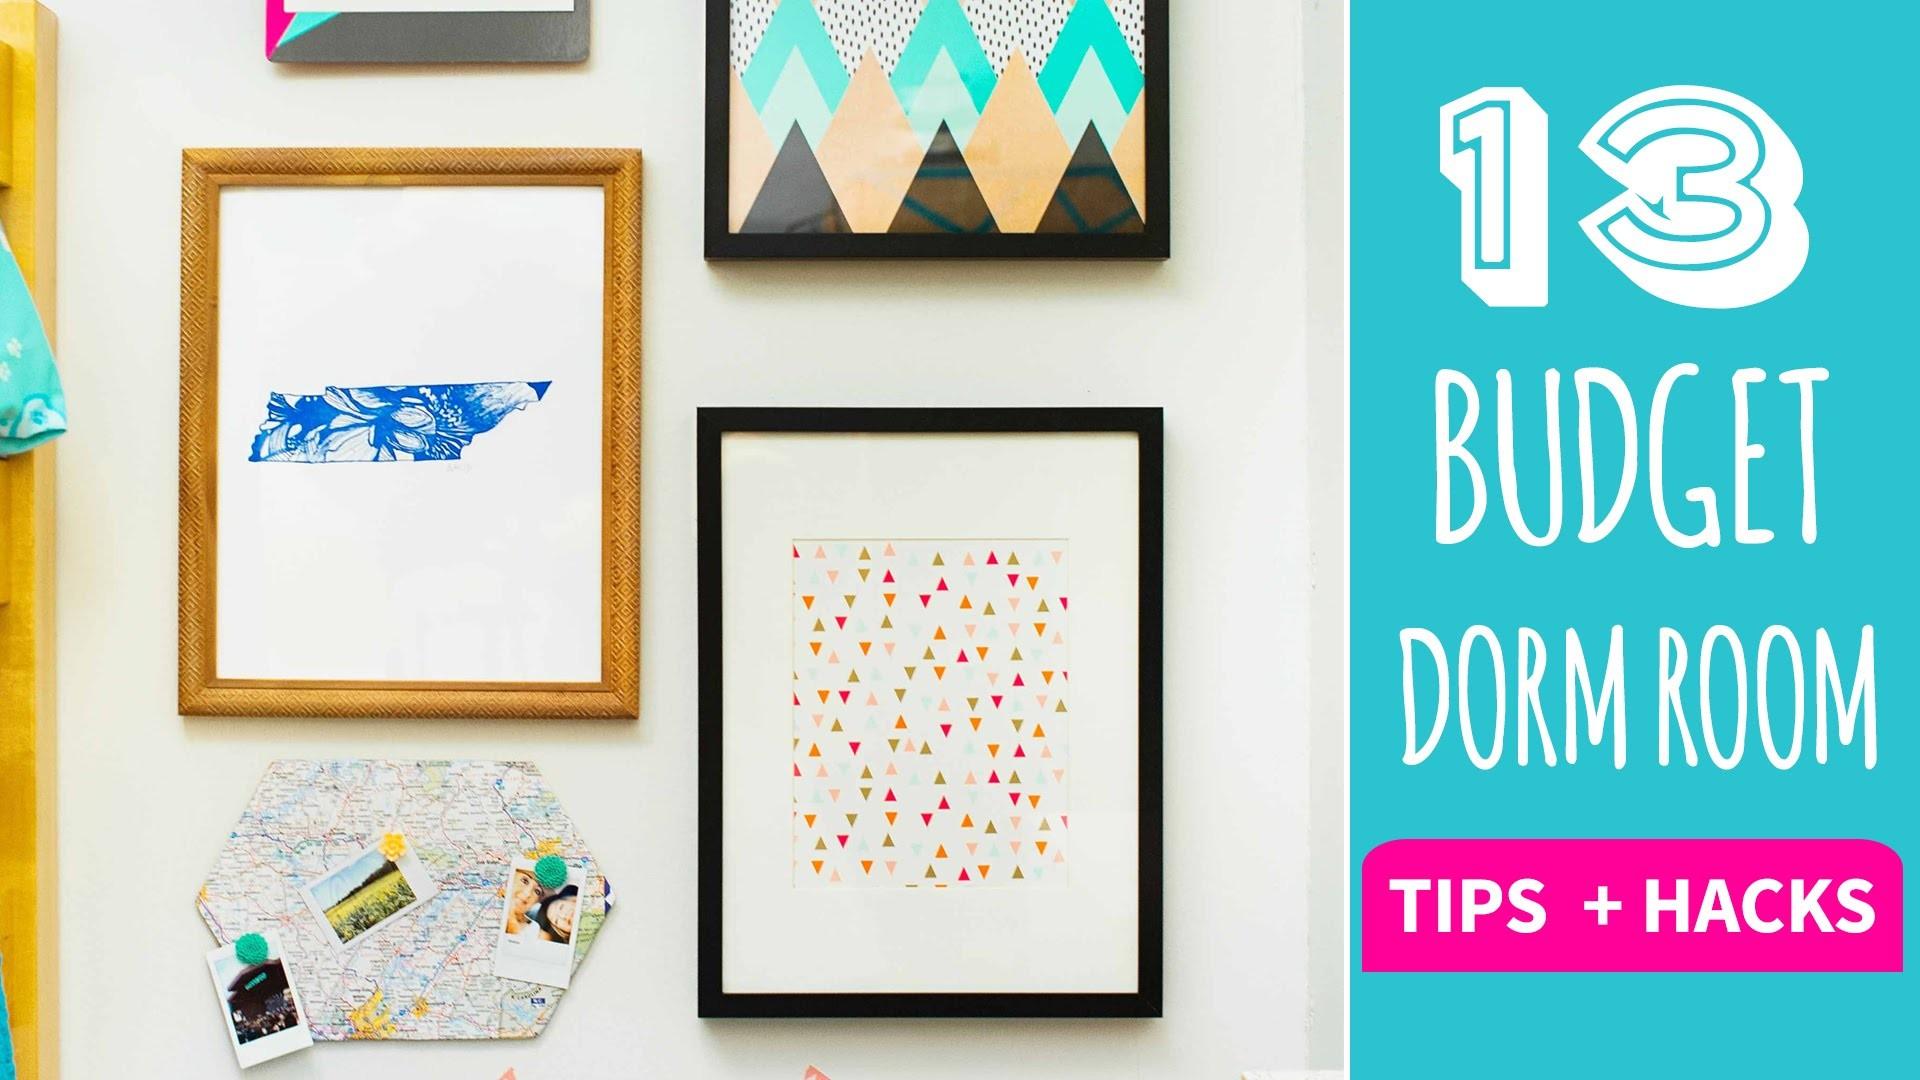 13 Tips and Hacks for Dorm Decor on a Budget - HGTV Handmade